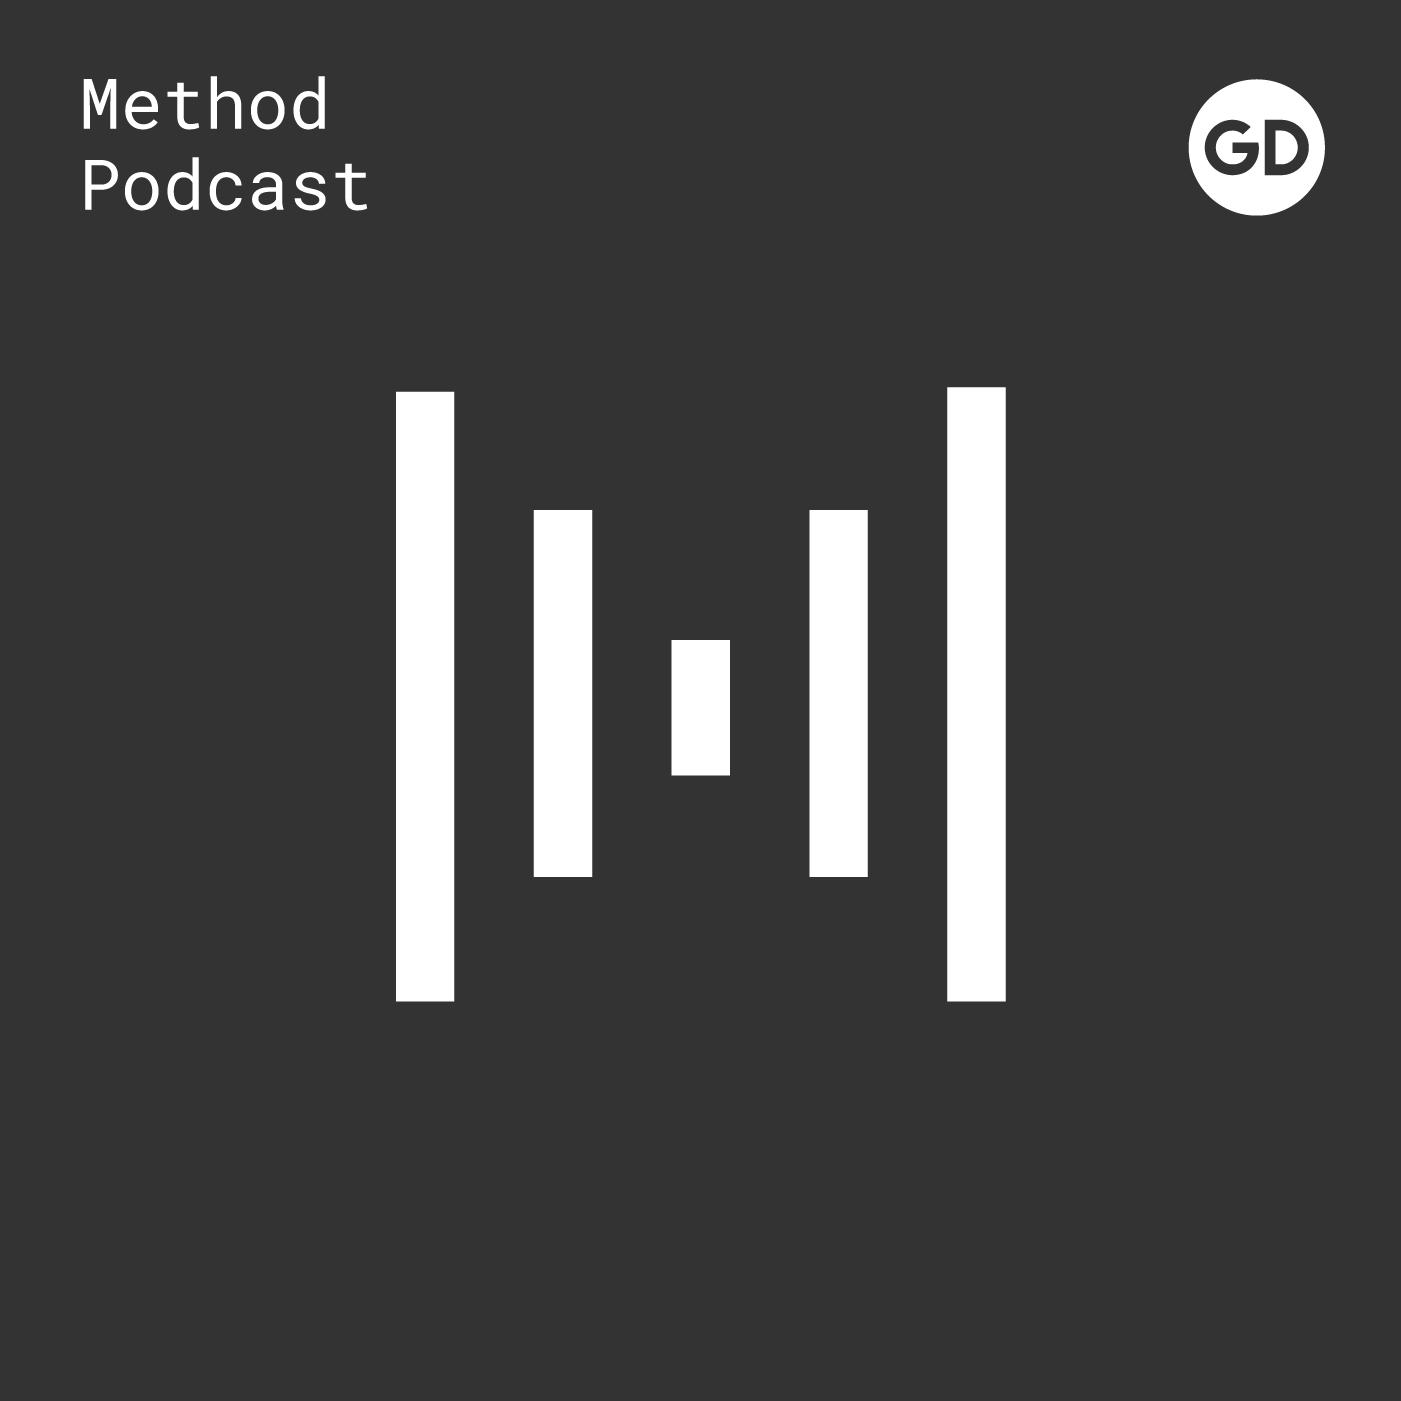 Method Podcast from Google Design